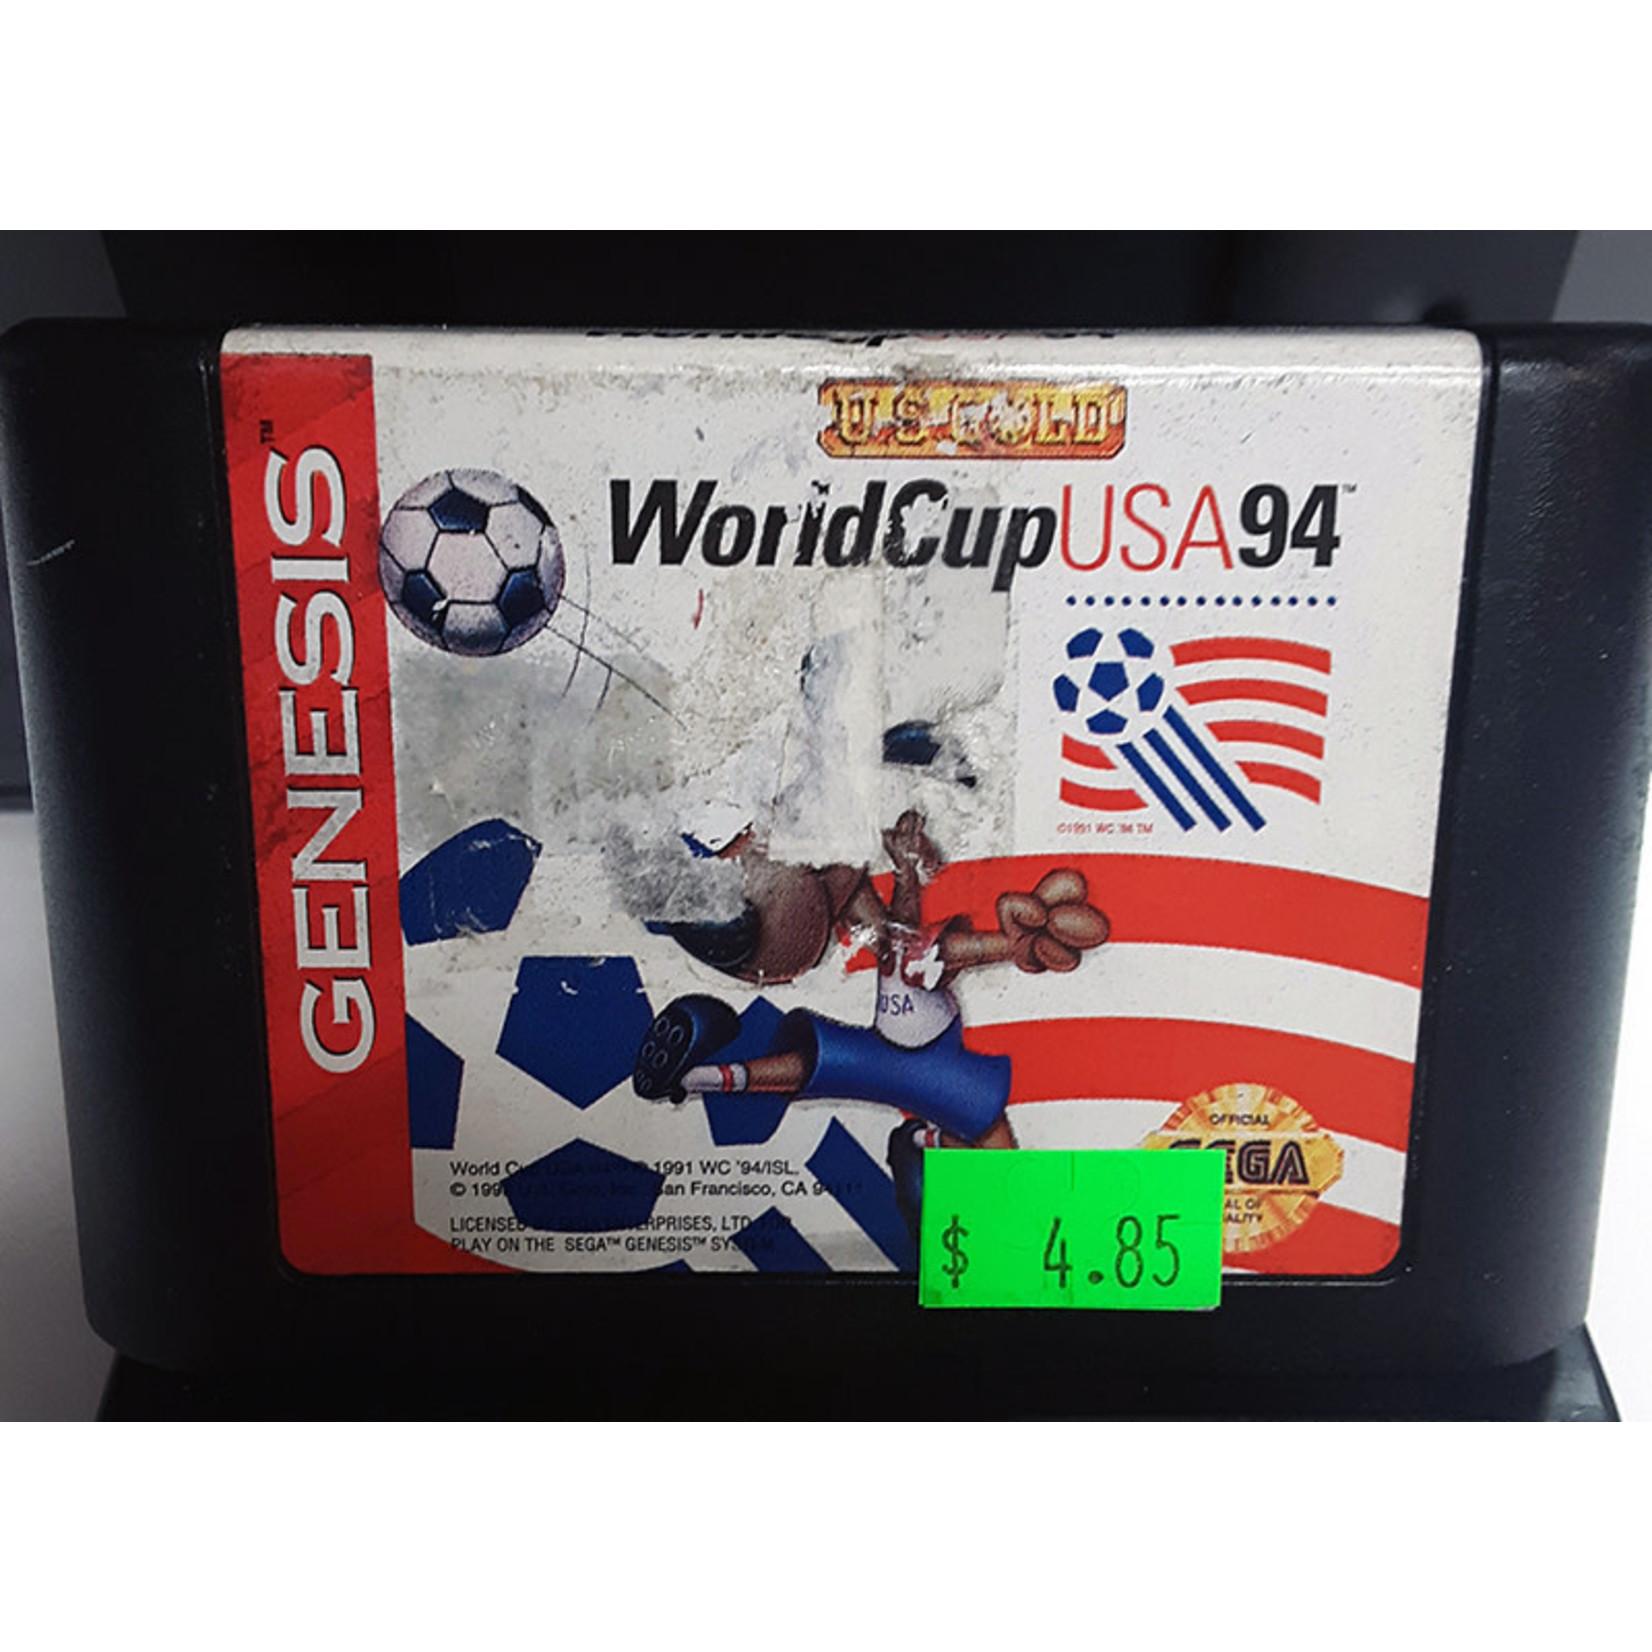 sgu-World Cup USA 94 (cartridge)